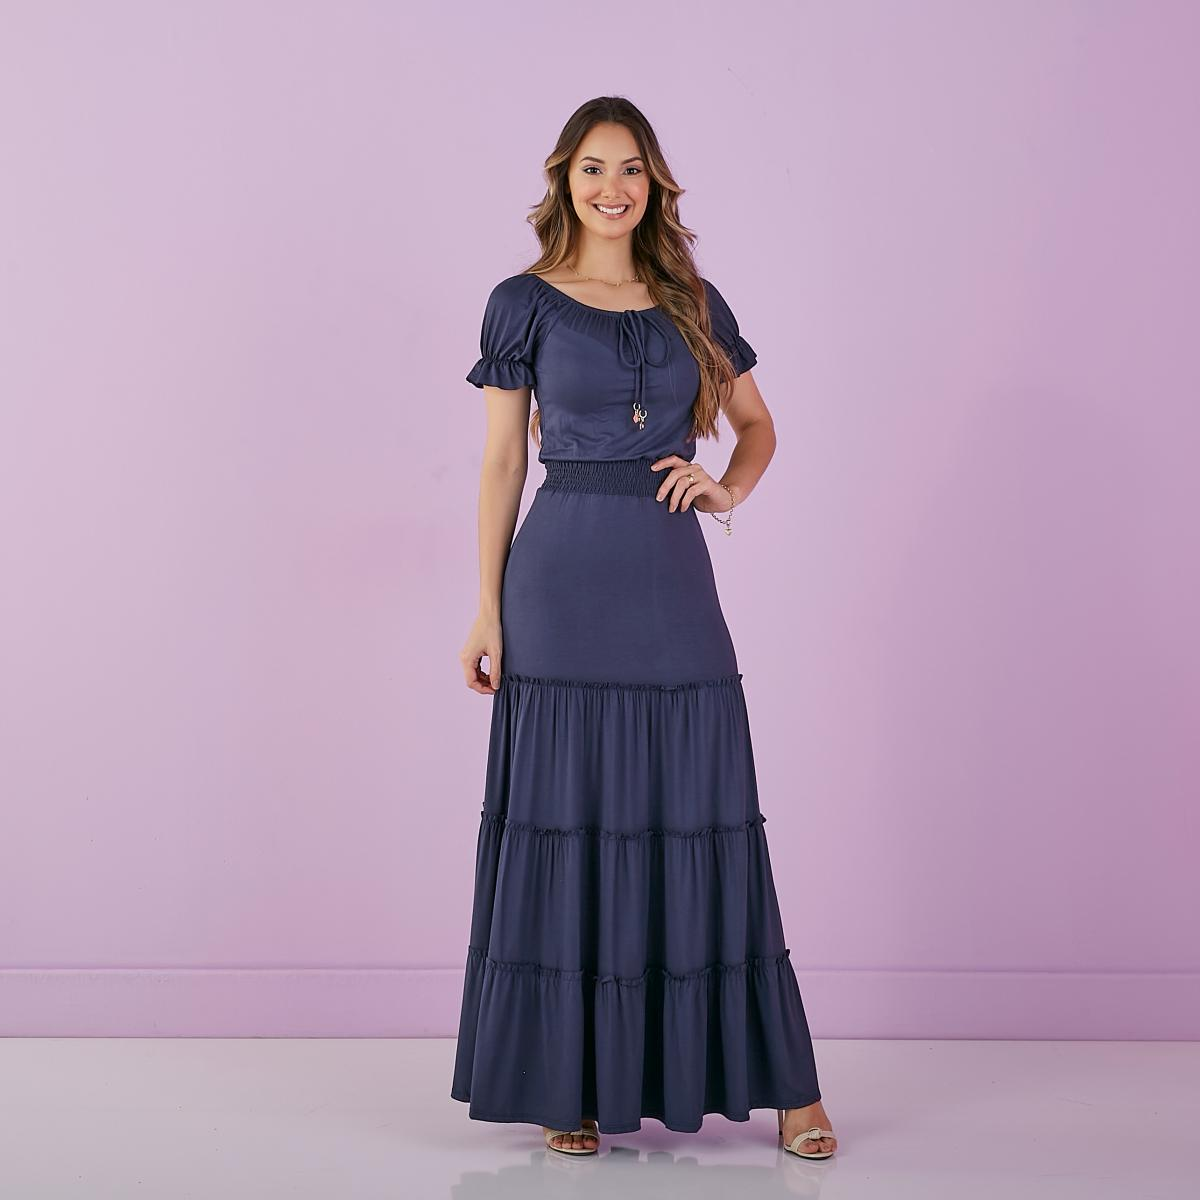 Vestido Katia Longo De Malha Com Lastex, Moda Evangélica - Tatá Martello